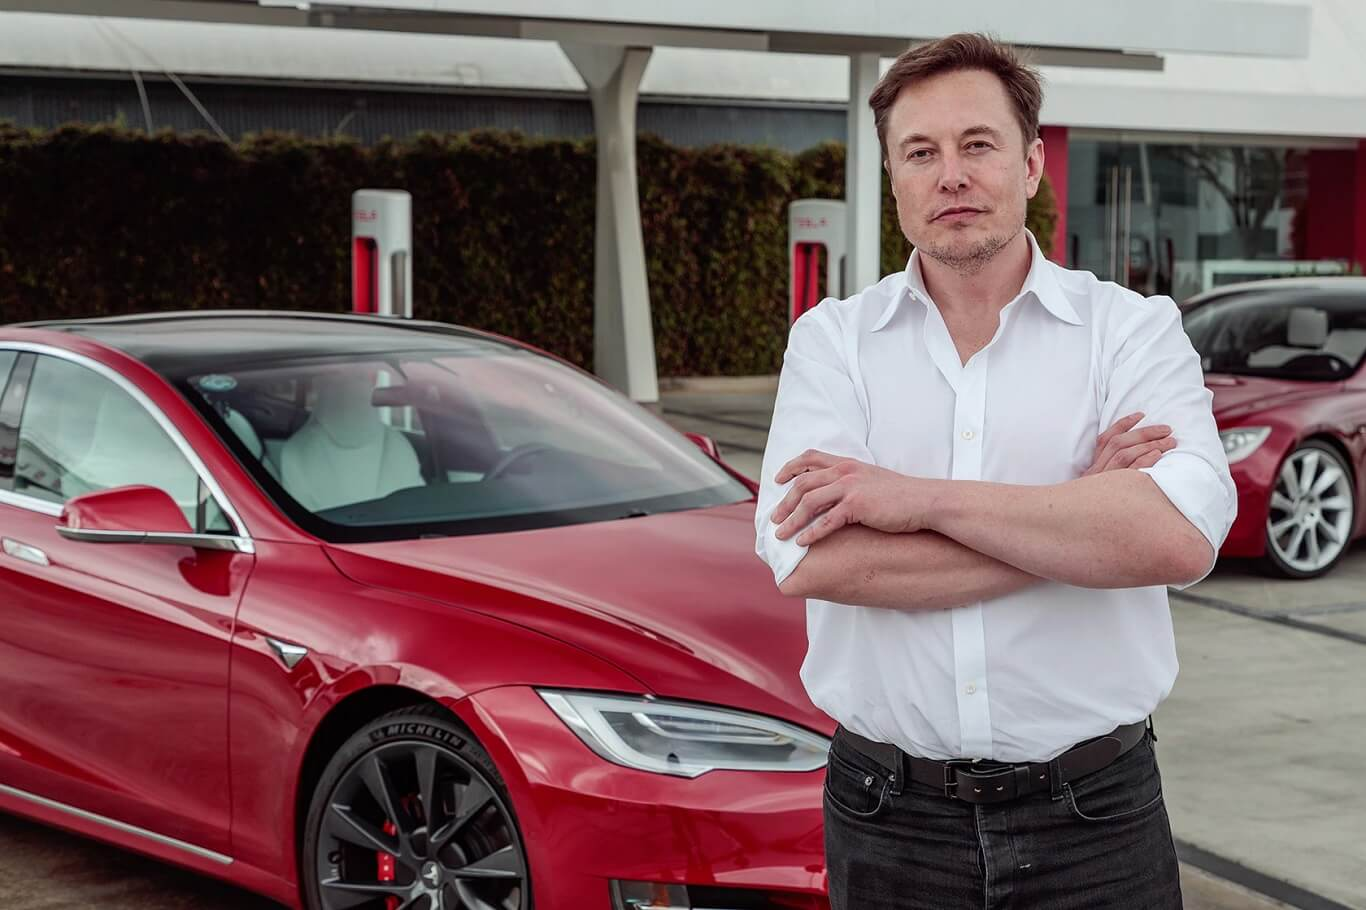 Tesla's autopilot under fire after the US opens formal